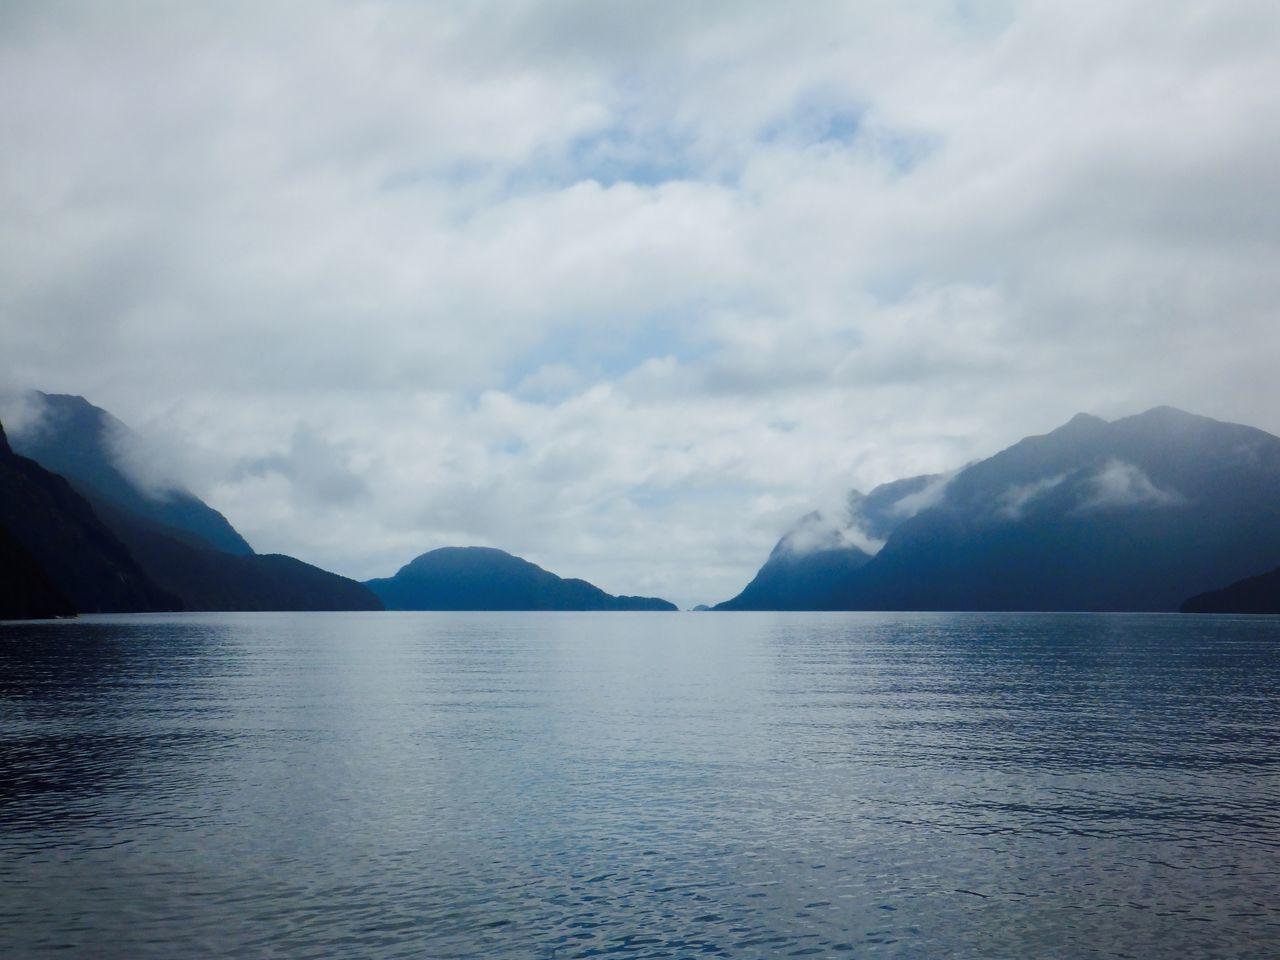 Horizon Mountains Nature Water Fiord Fiordland Doubtful Sound New Zealand South Island Tourist Destination